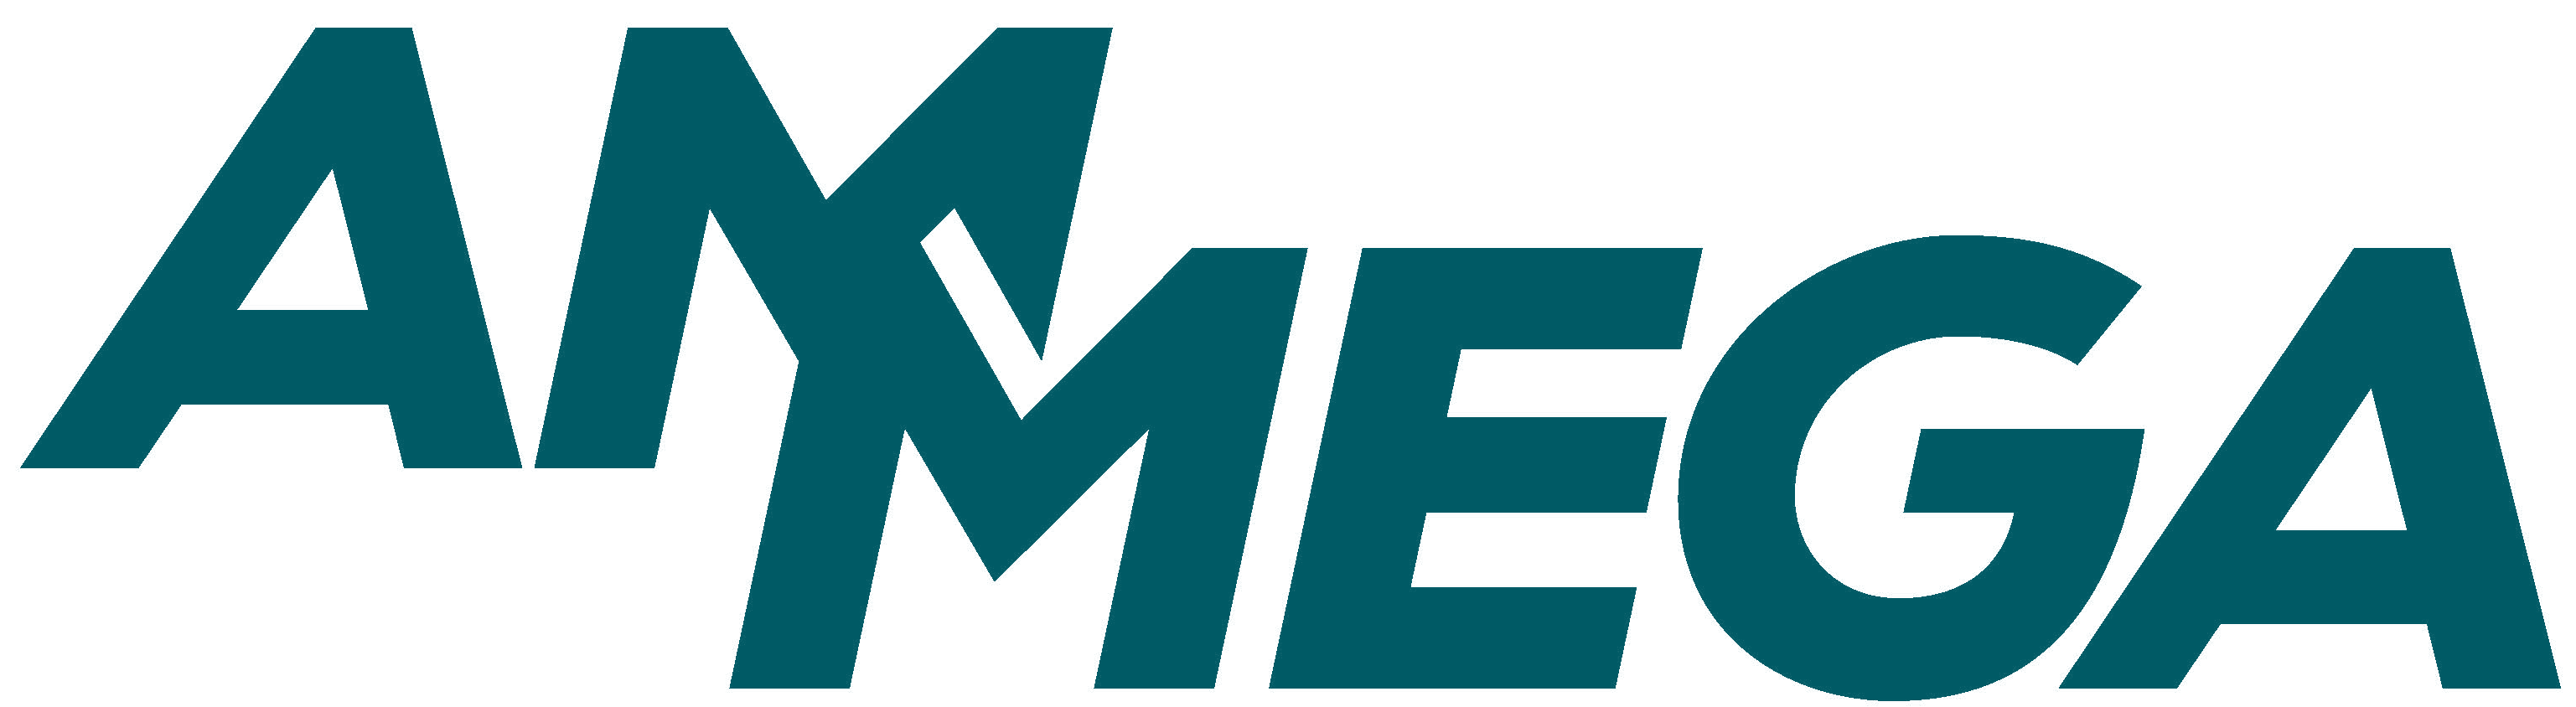 Ammega - Logotipo oficial